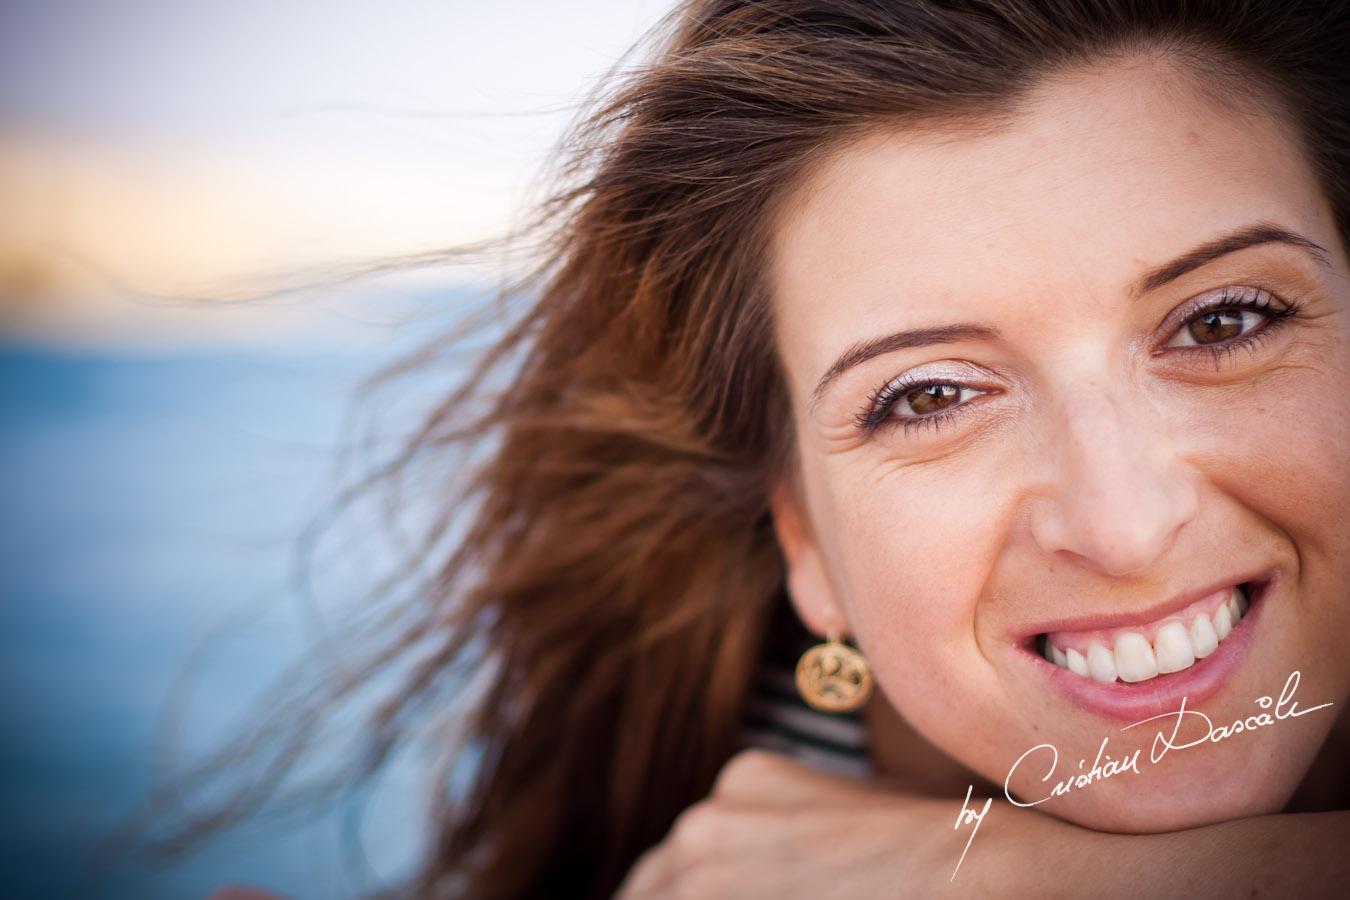 Vlad & Anca - Engagement Photo Session. Cyprus Professional Photographer: Cristian Dascalu